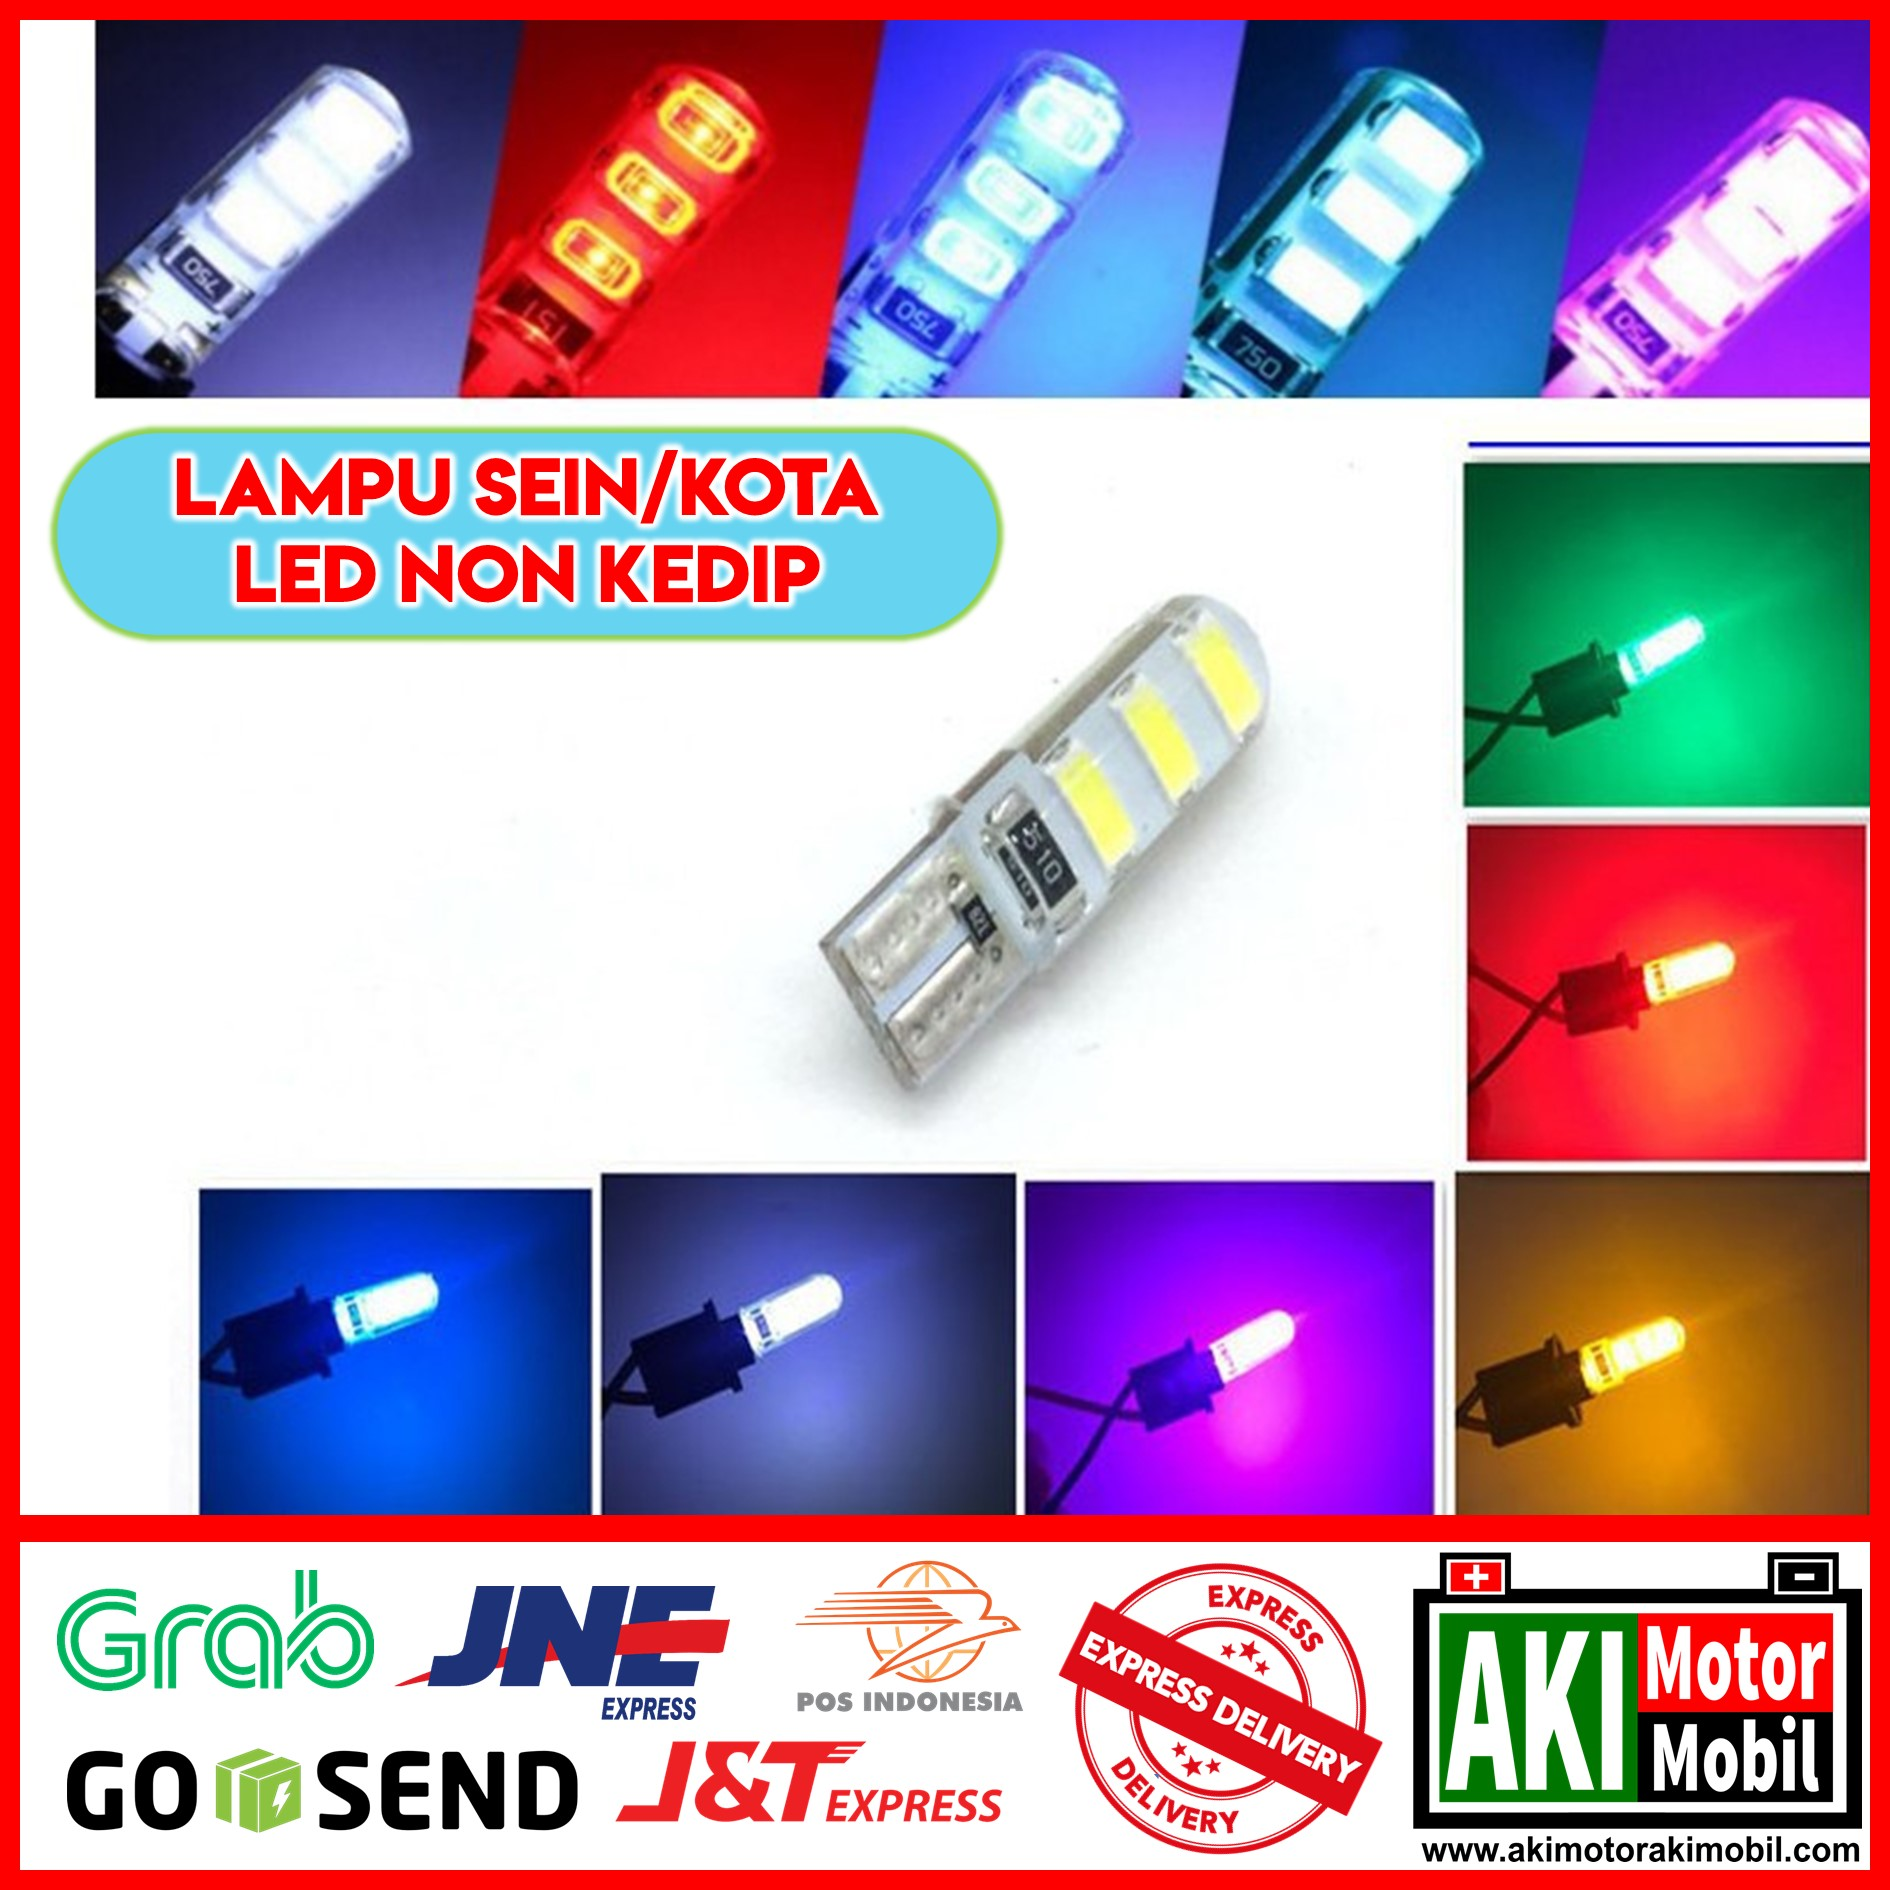 BEST SELLER - LAMPU SENJA LED REMOTE T10 RGB - LAMPU SEIN SIGN SEN / SEPASANG LAMPU LED T10 MOBIL MOTOR RGB NON REMOTE 16 WARNA / LAMPU SEN SENJA LED RGB T10 5050 SMD WARNA NON REMOT CONTROL UNIVERSAL MOTOR MOBIL